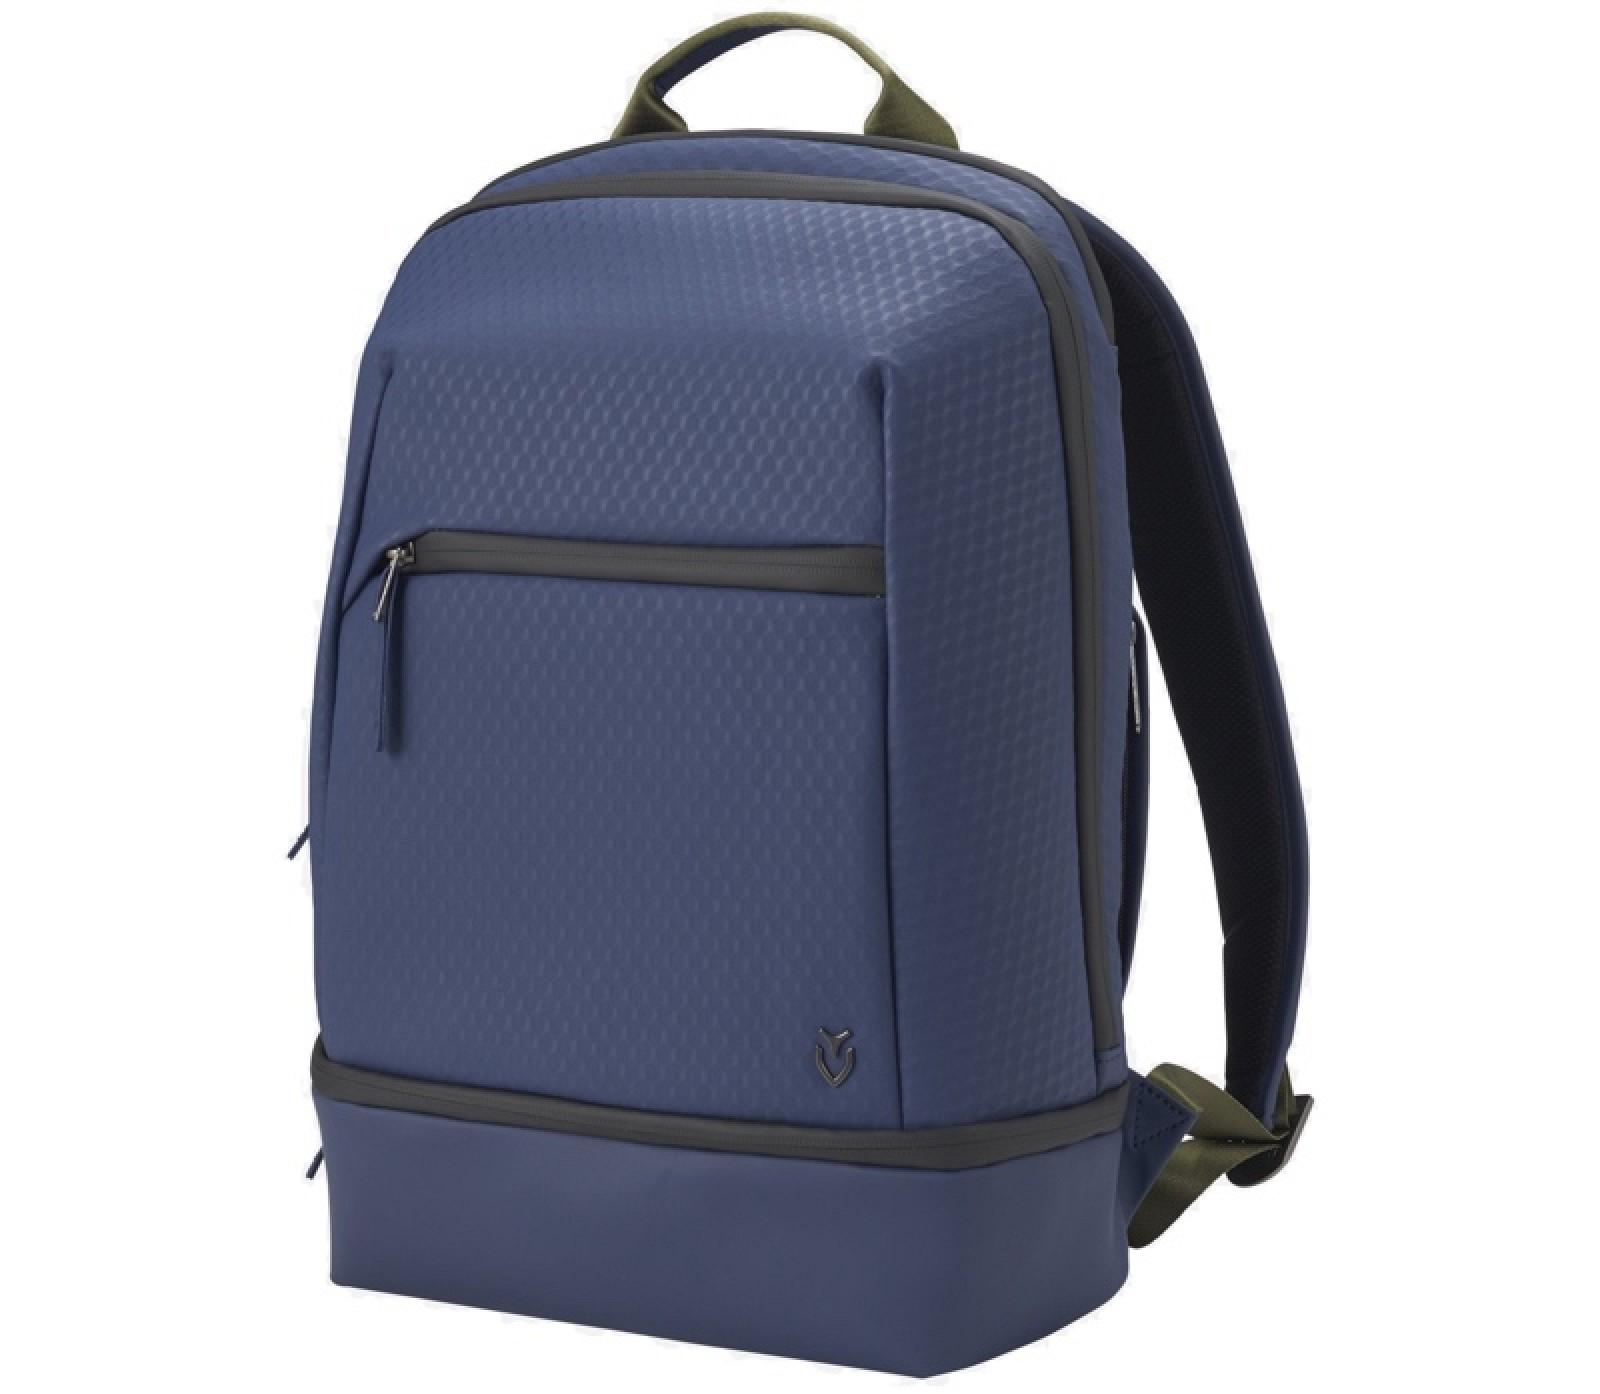 backpack giveaway in bakersfield 2019